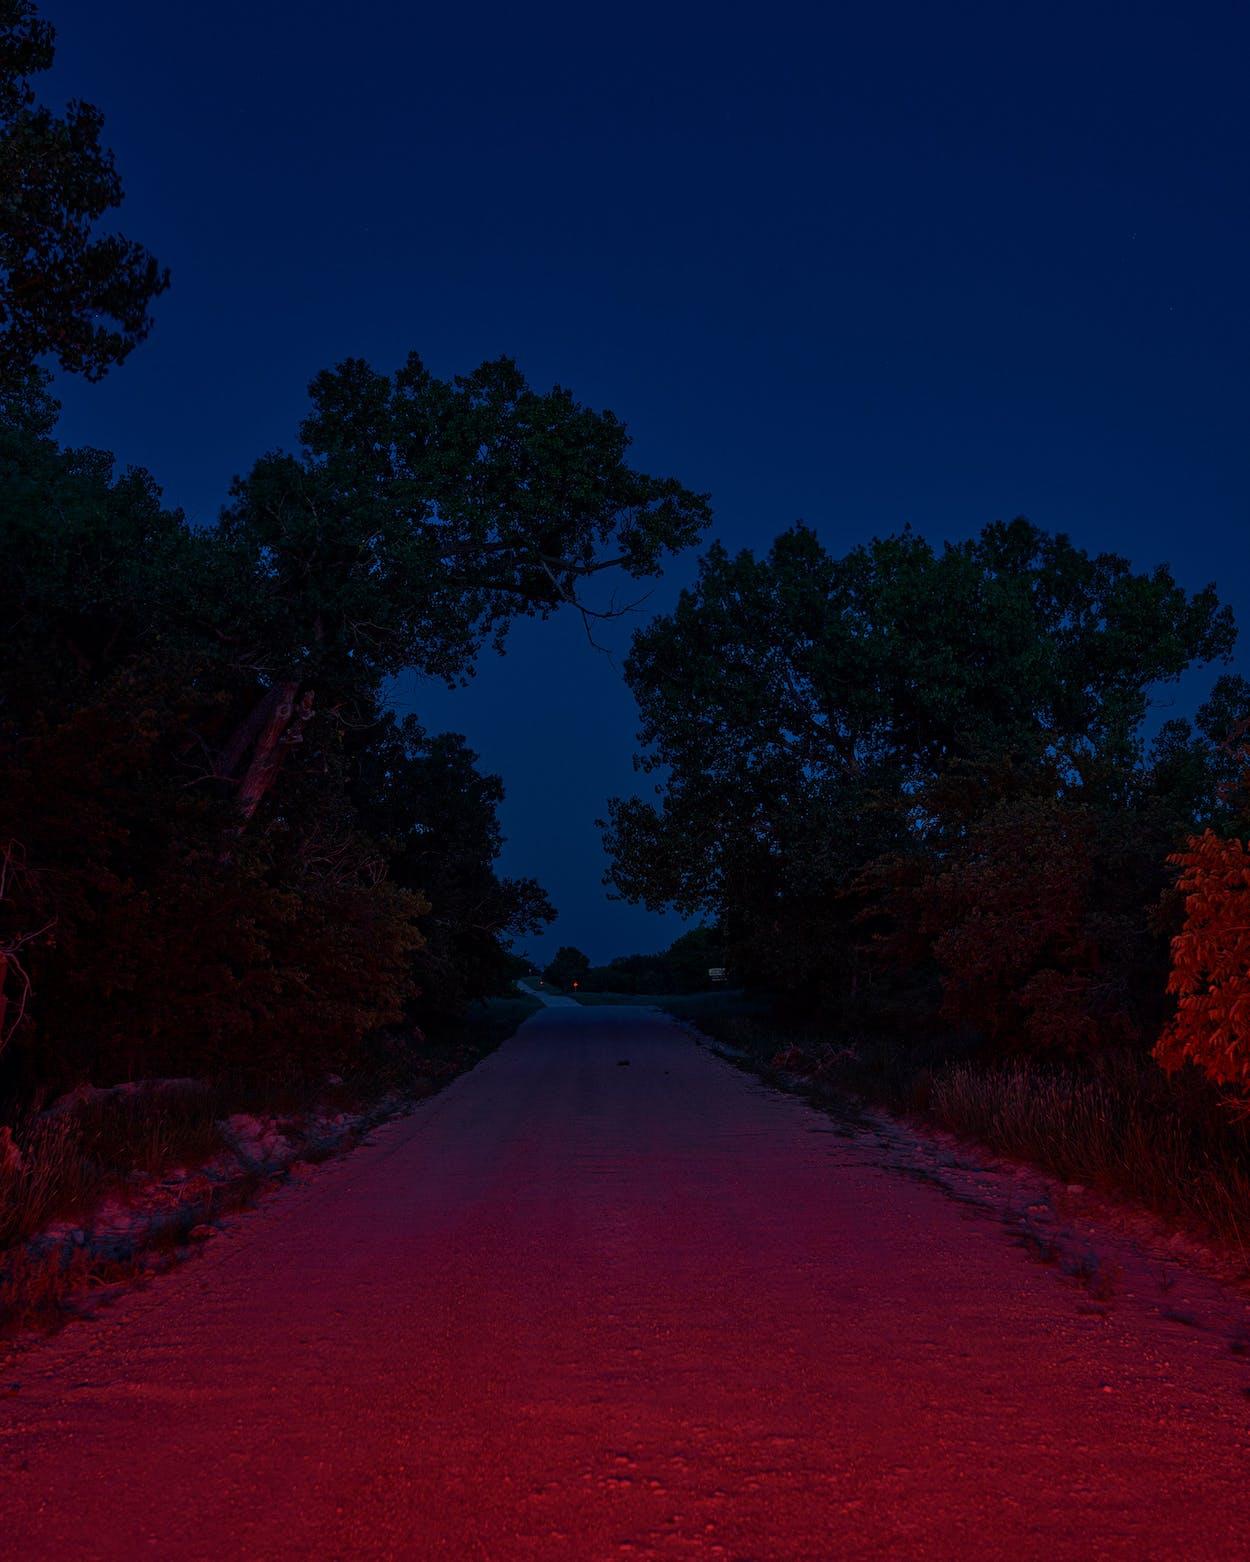 Lake Marvin Road